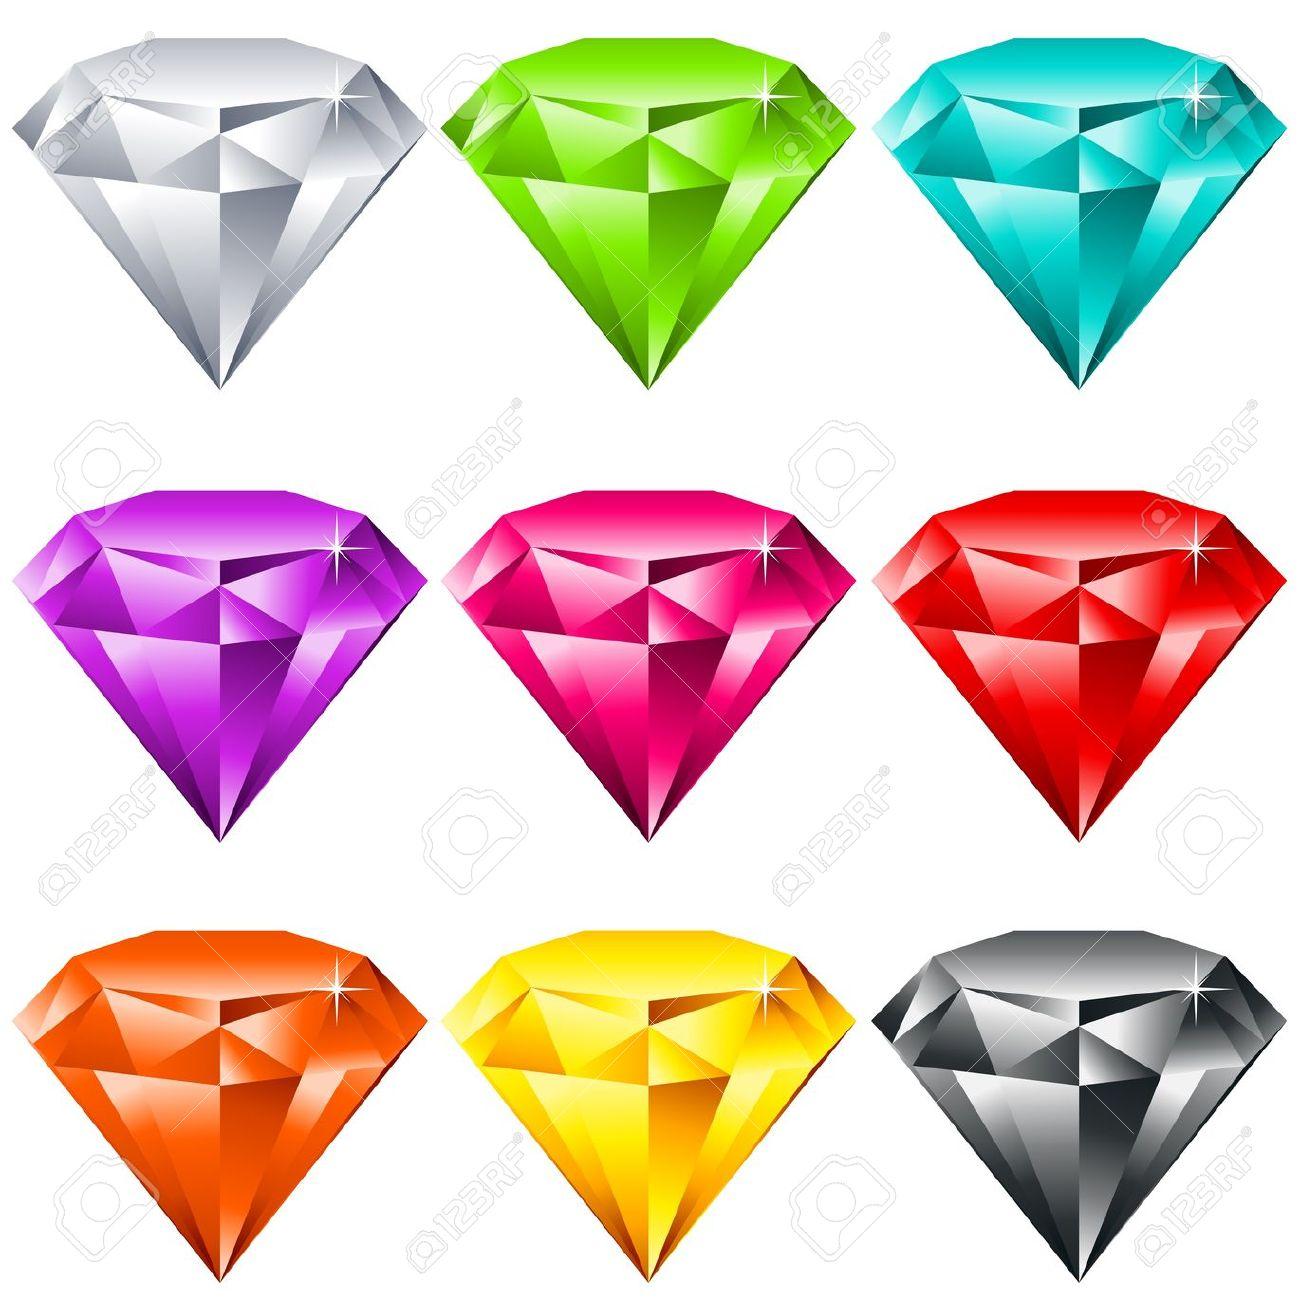 Gems clipart cartoon Gems Clipart clipart Free jewelry